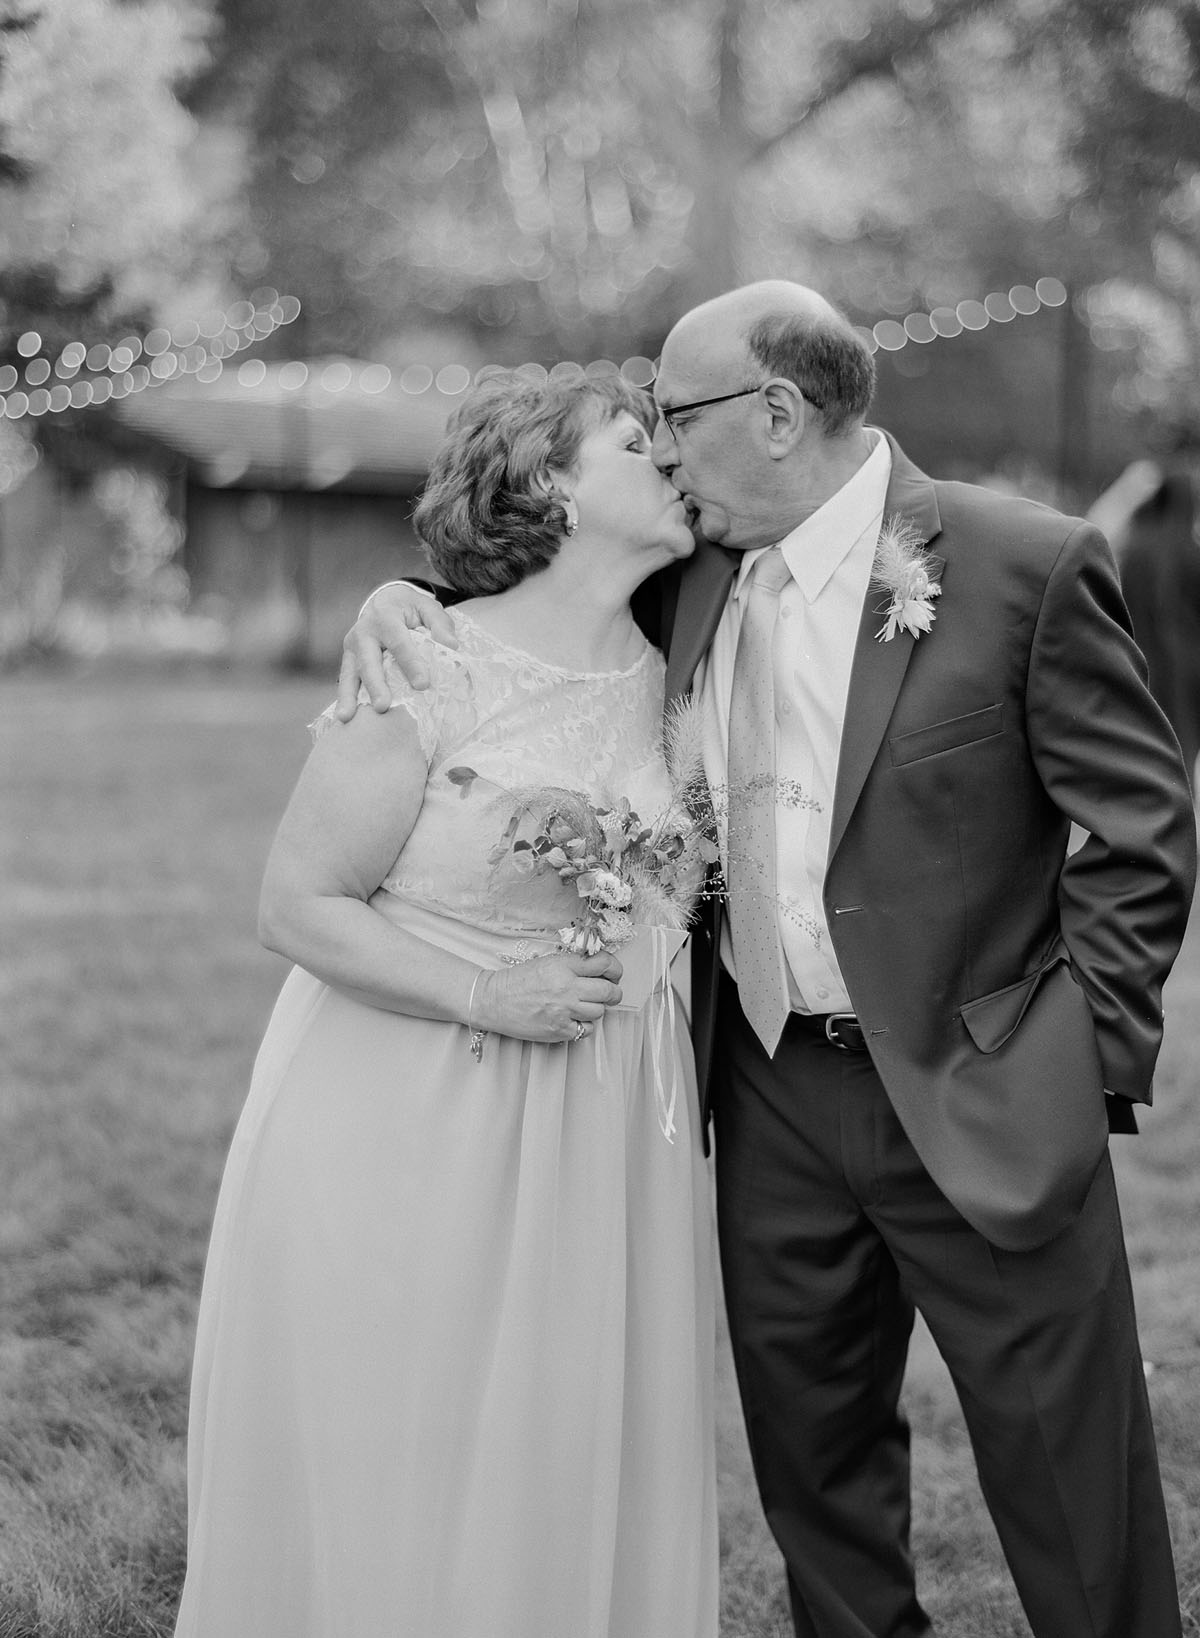 47-parents-kiss-wedding.jpg